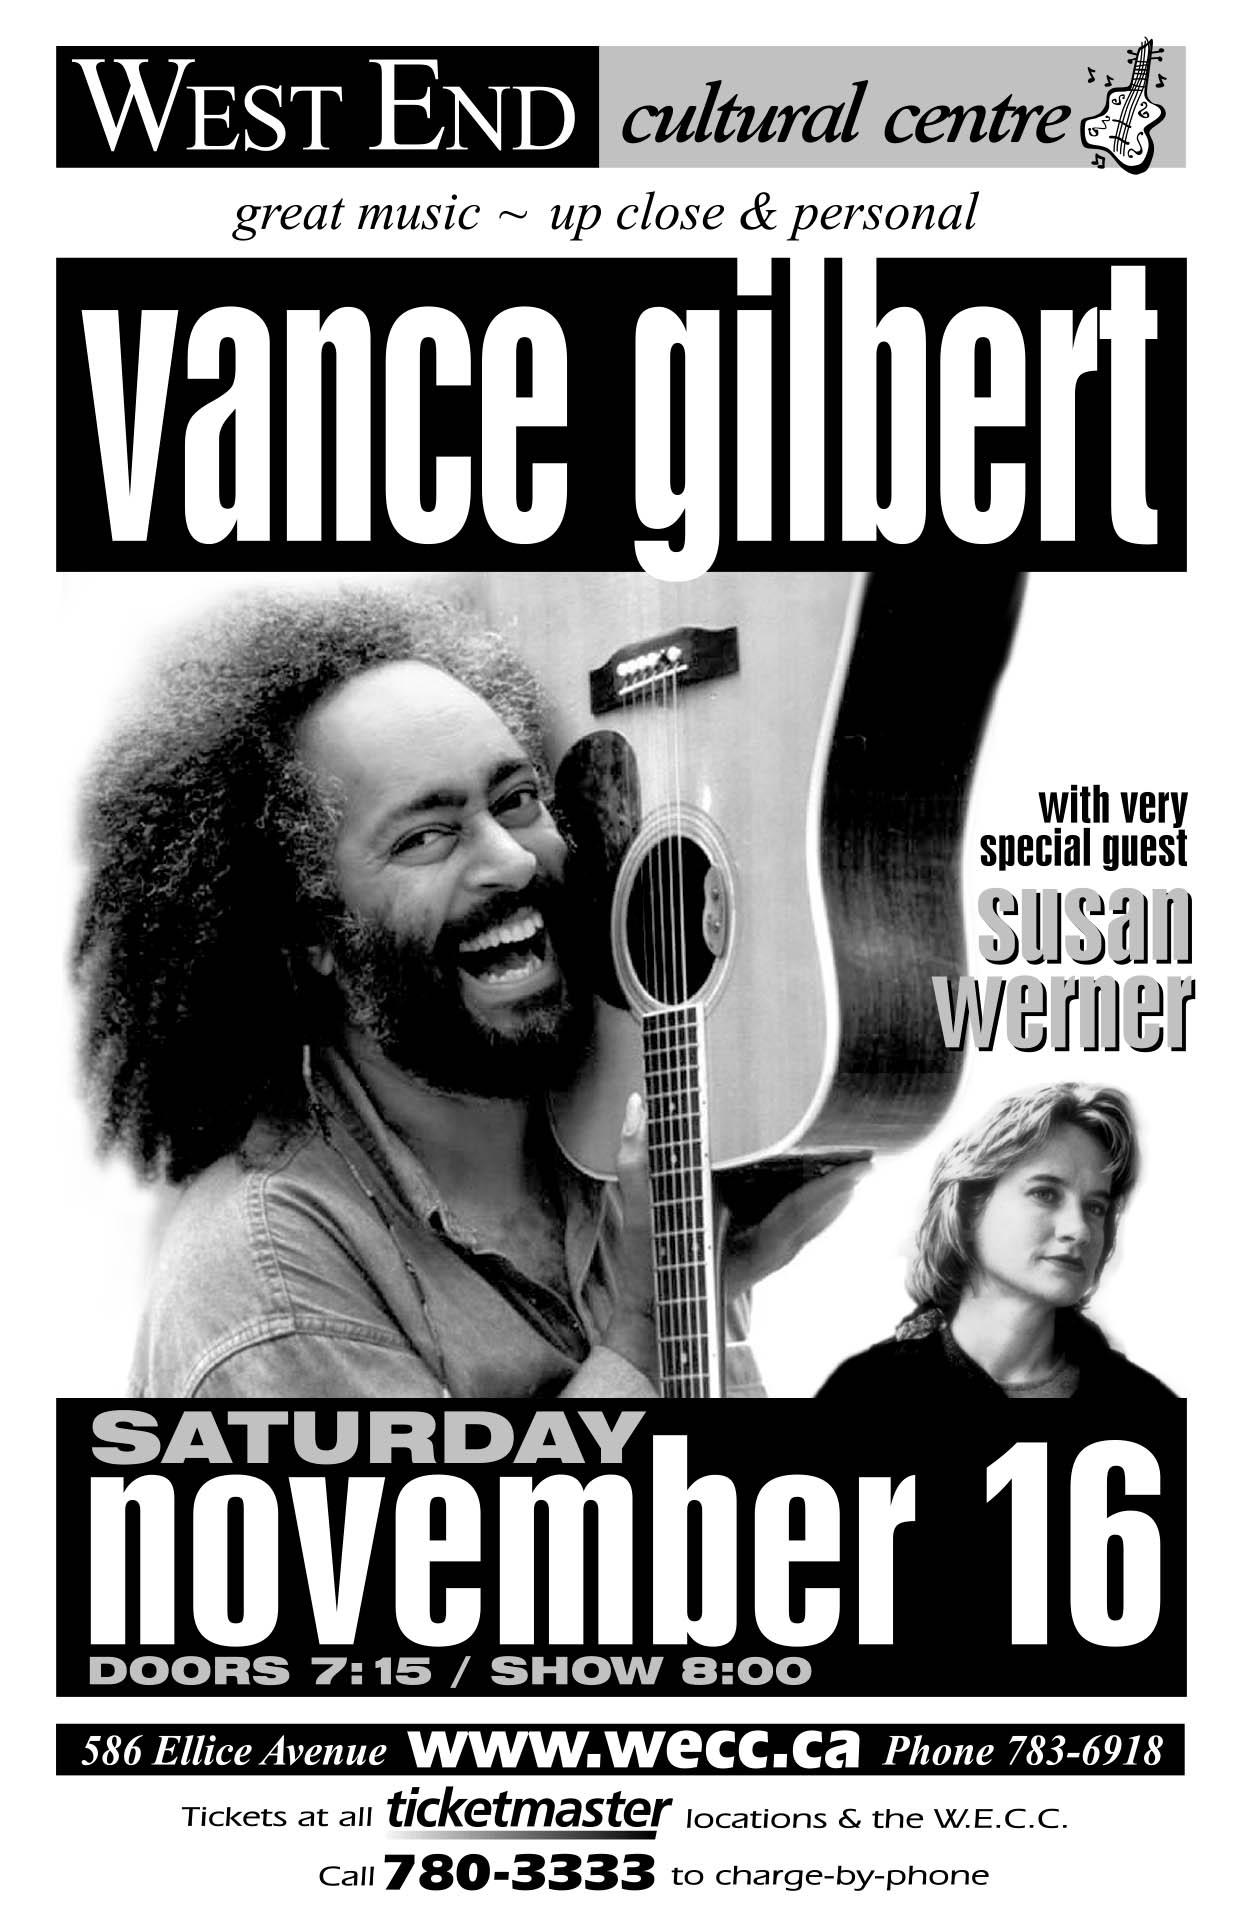 VANCE GILBERT – 2002